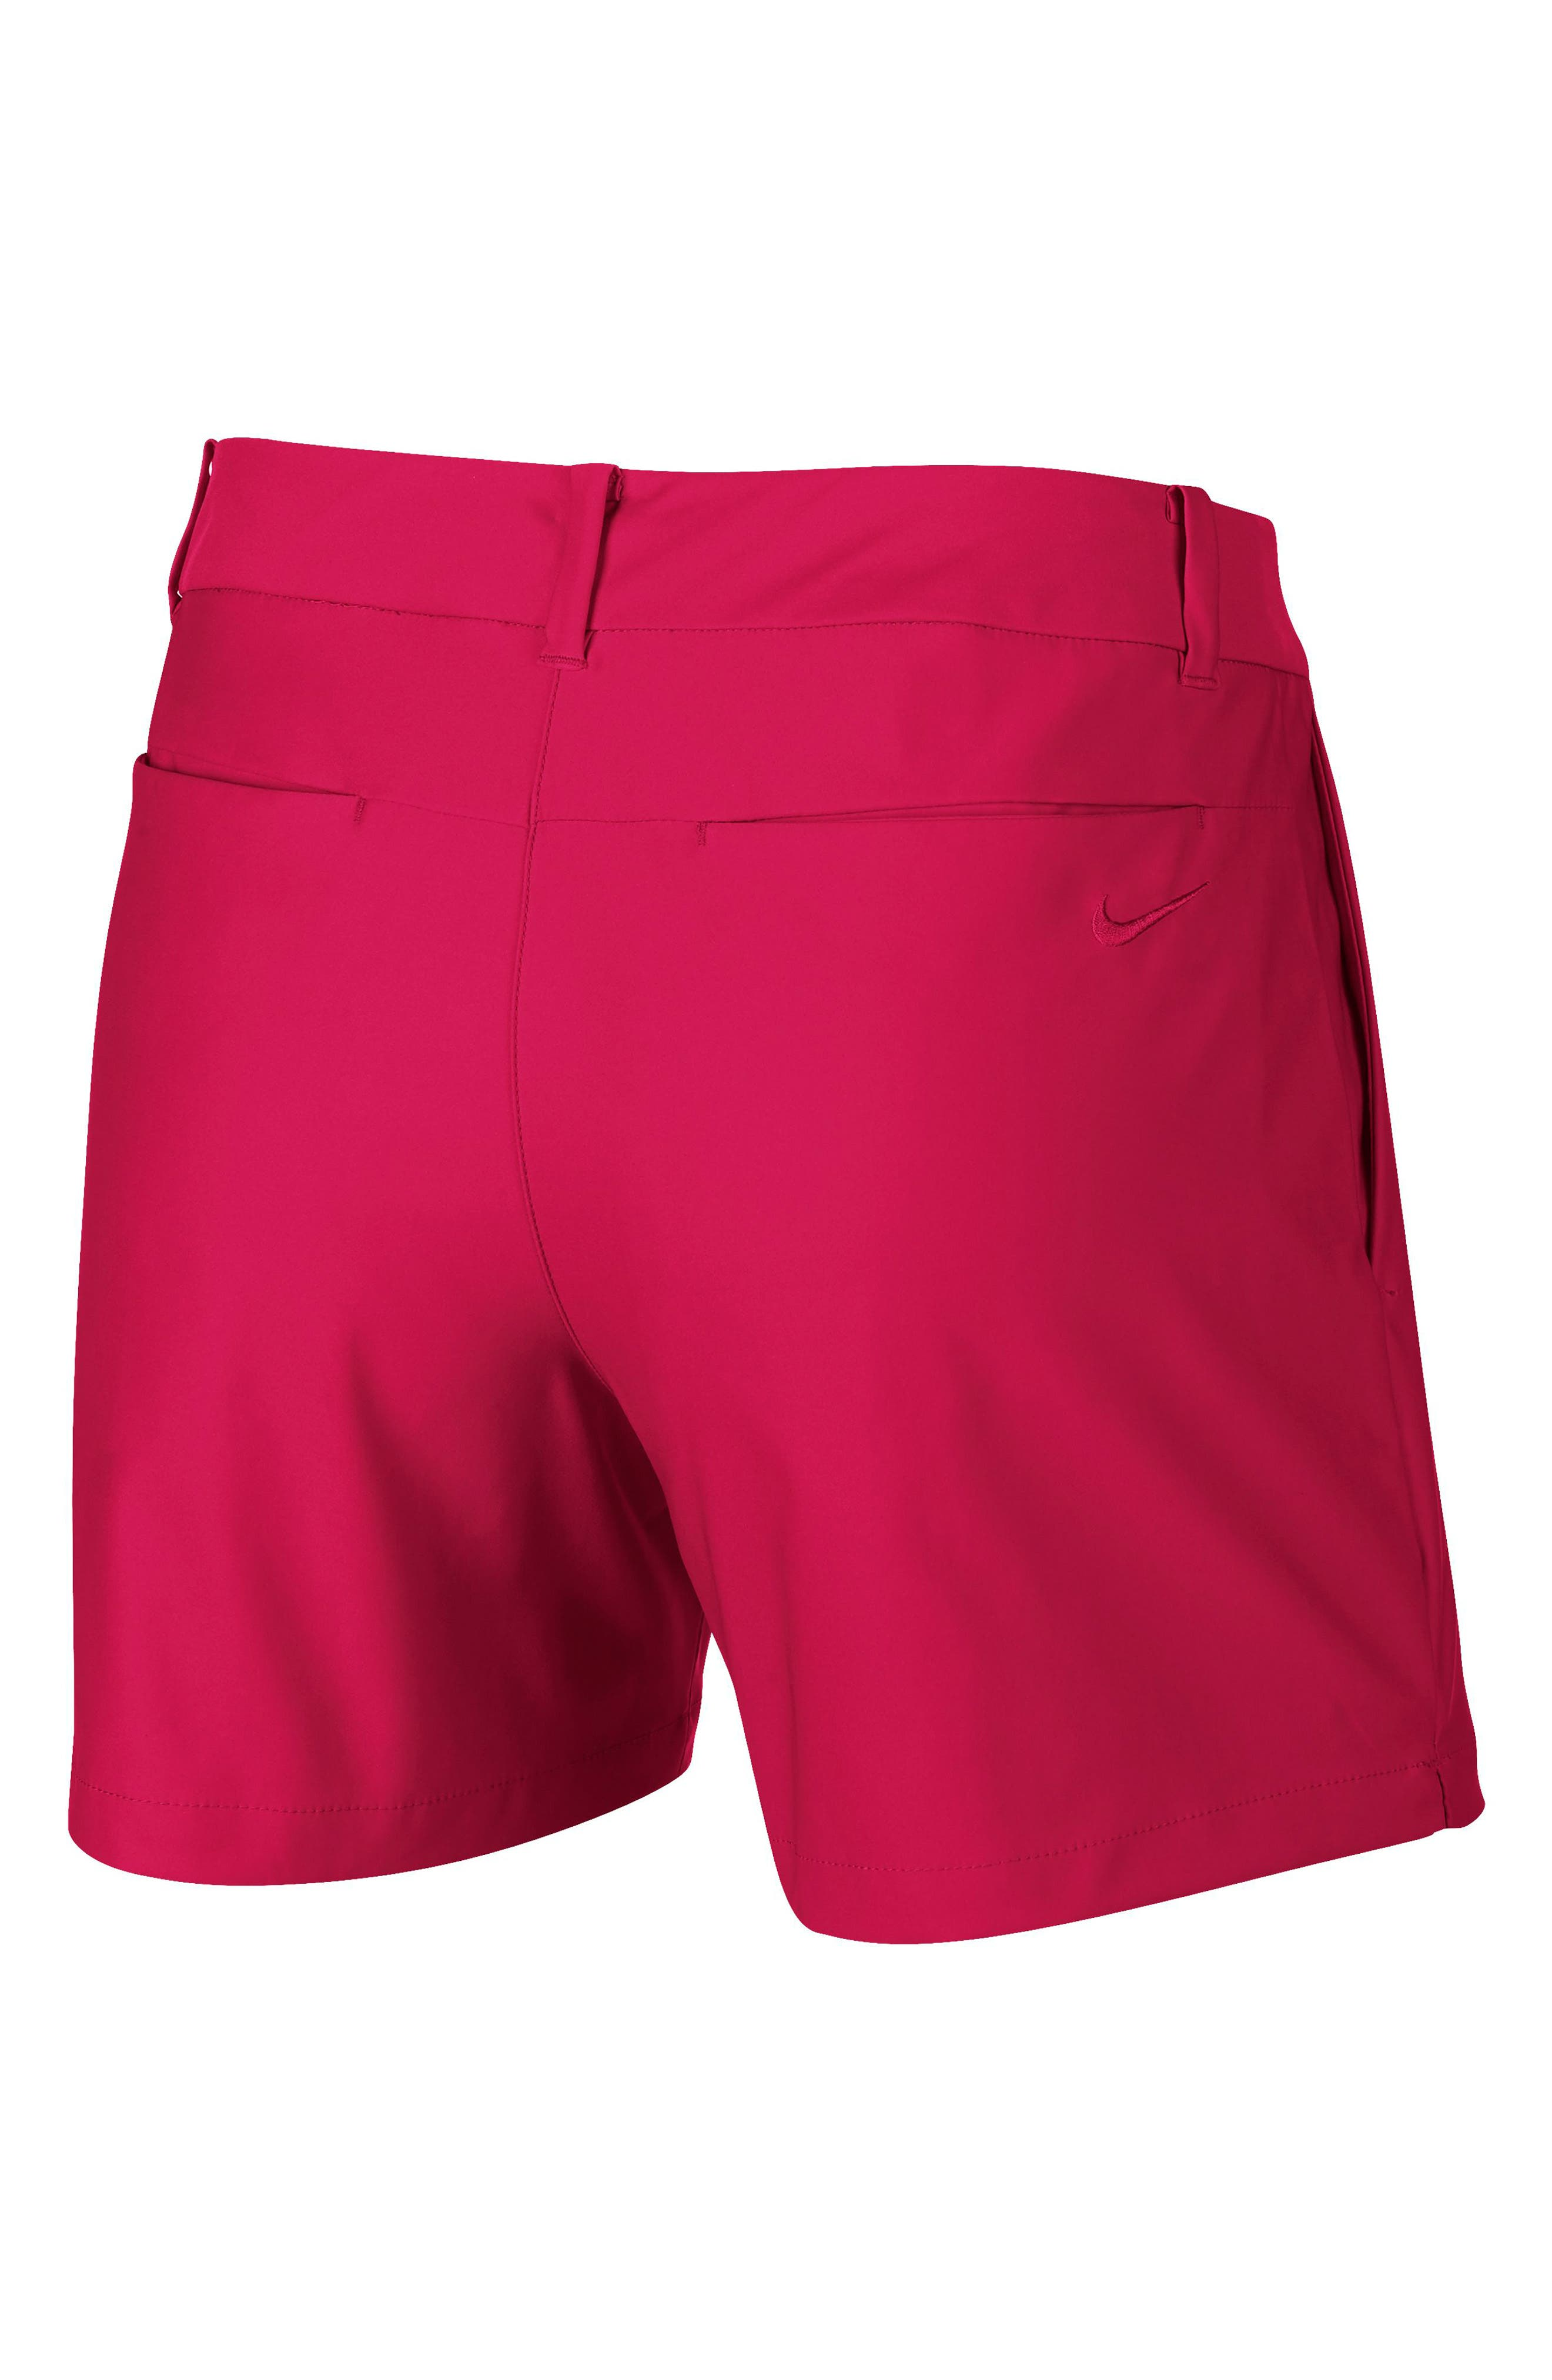 Flex Golf Shorts,                             Alternate thumbnail 2, color,                             RUSH PINK/ RUSH PINK